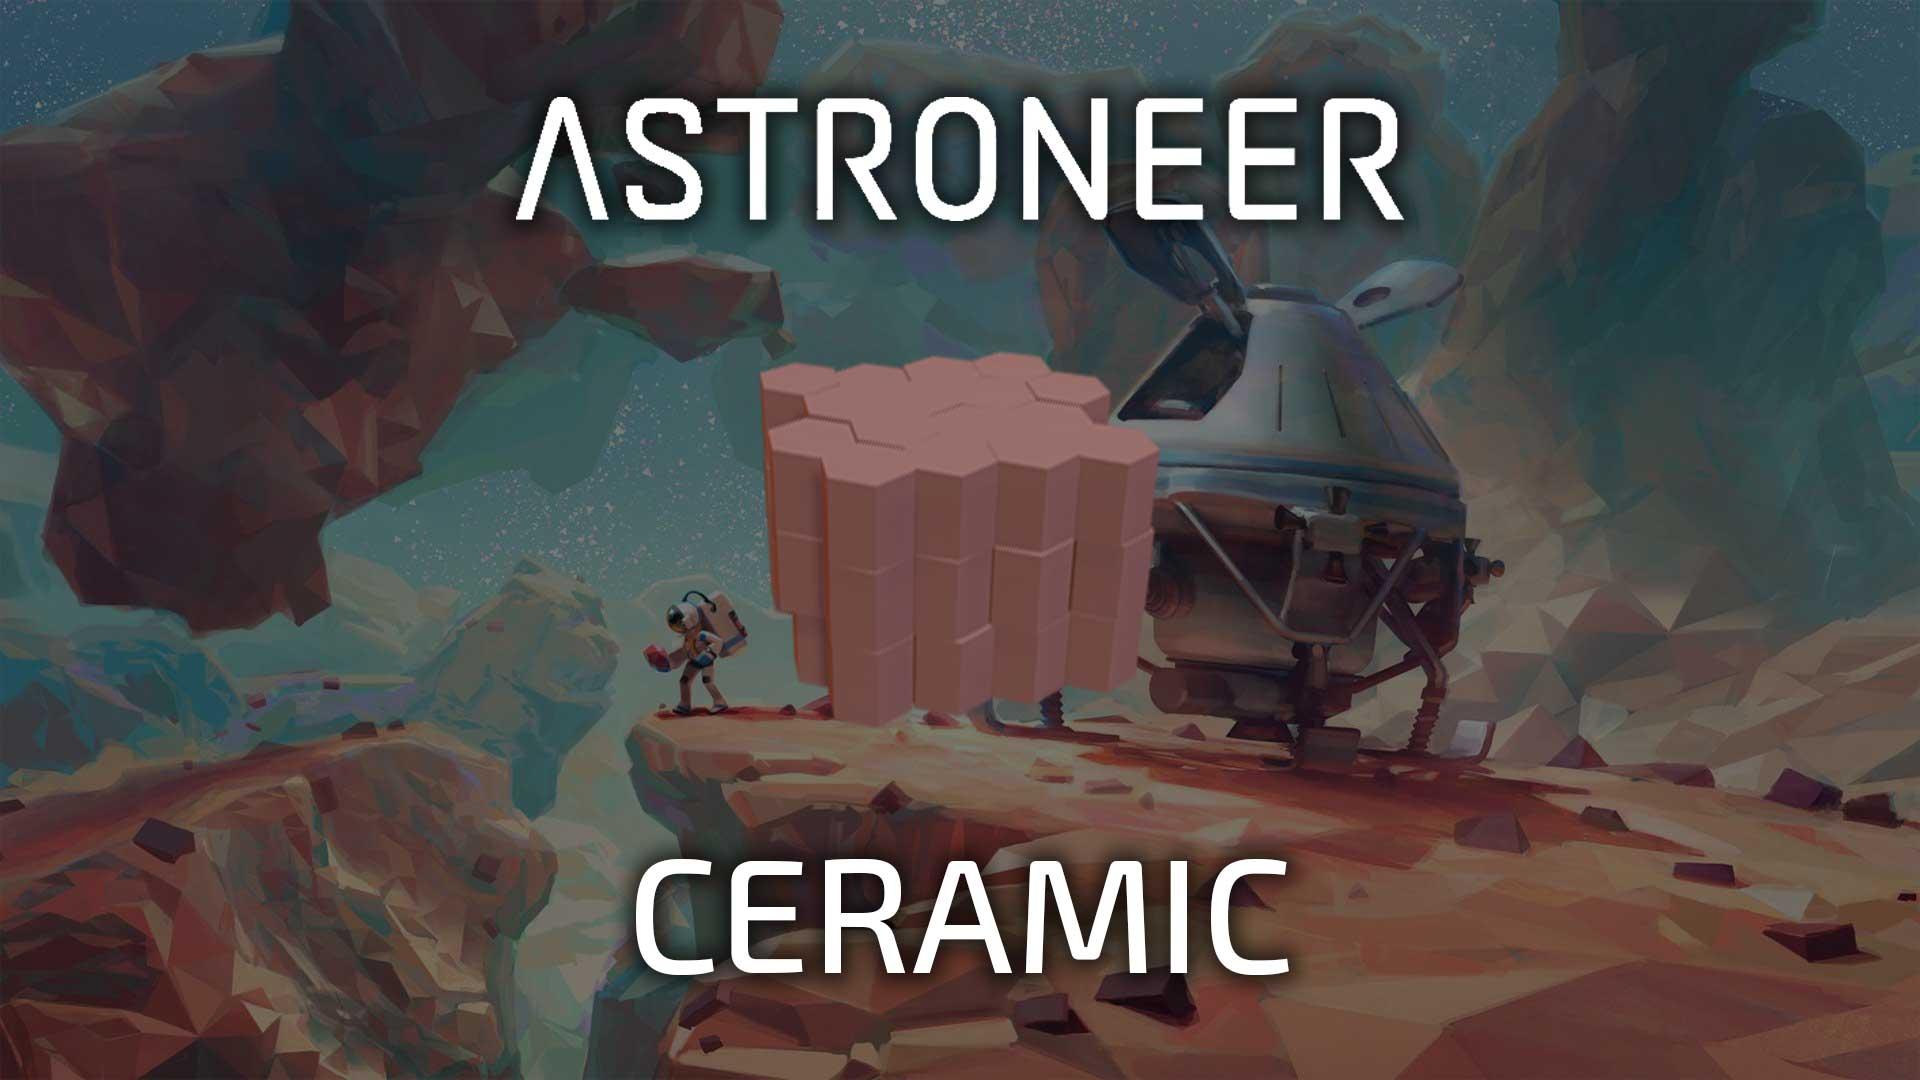 astroneer ceramic